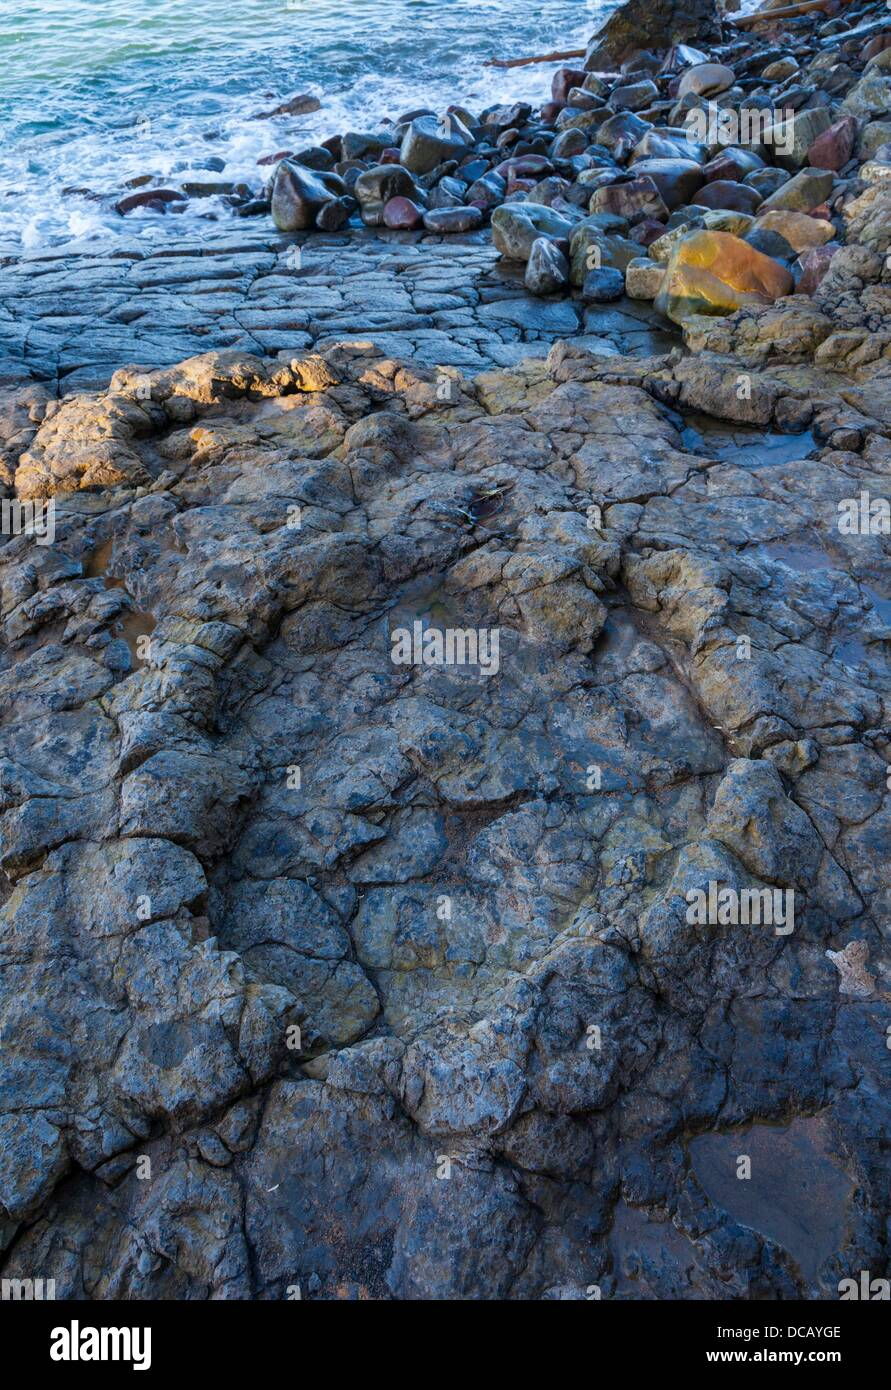 Largest ichnites of sauropod dinosaurs, La Griega Beach, Lastres - Llastres Village, Colunga Council, Asturias, Stock Photo